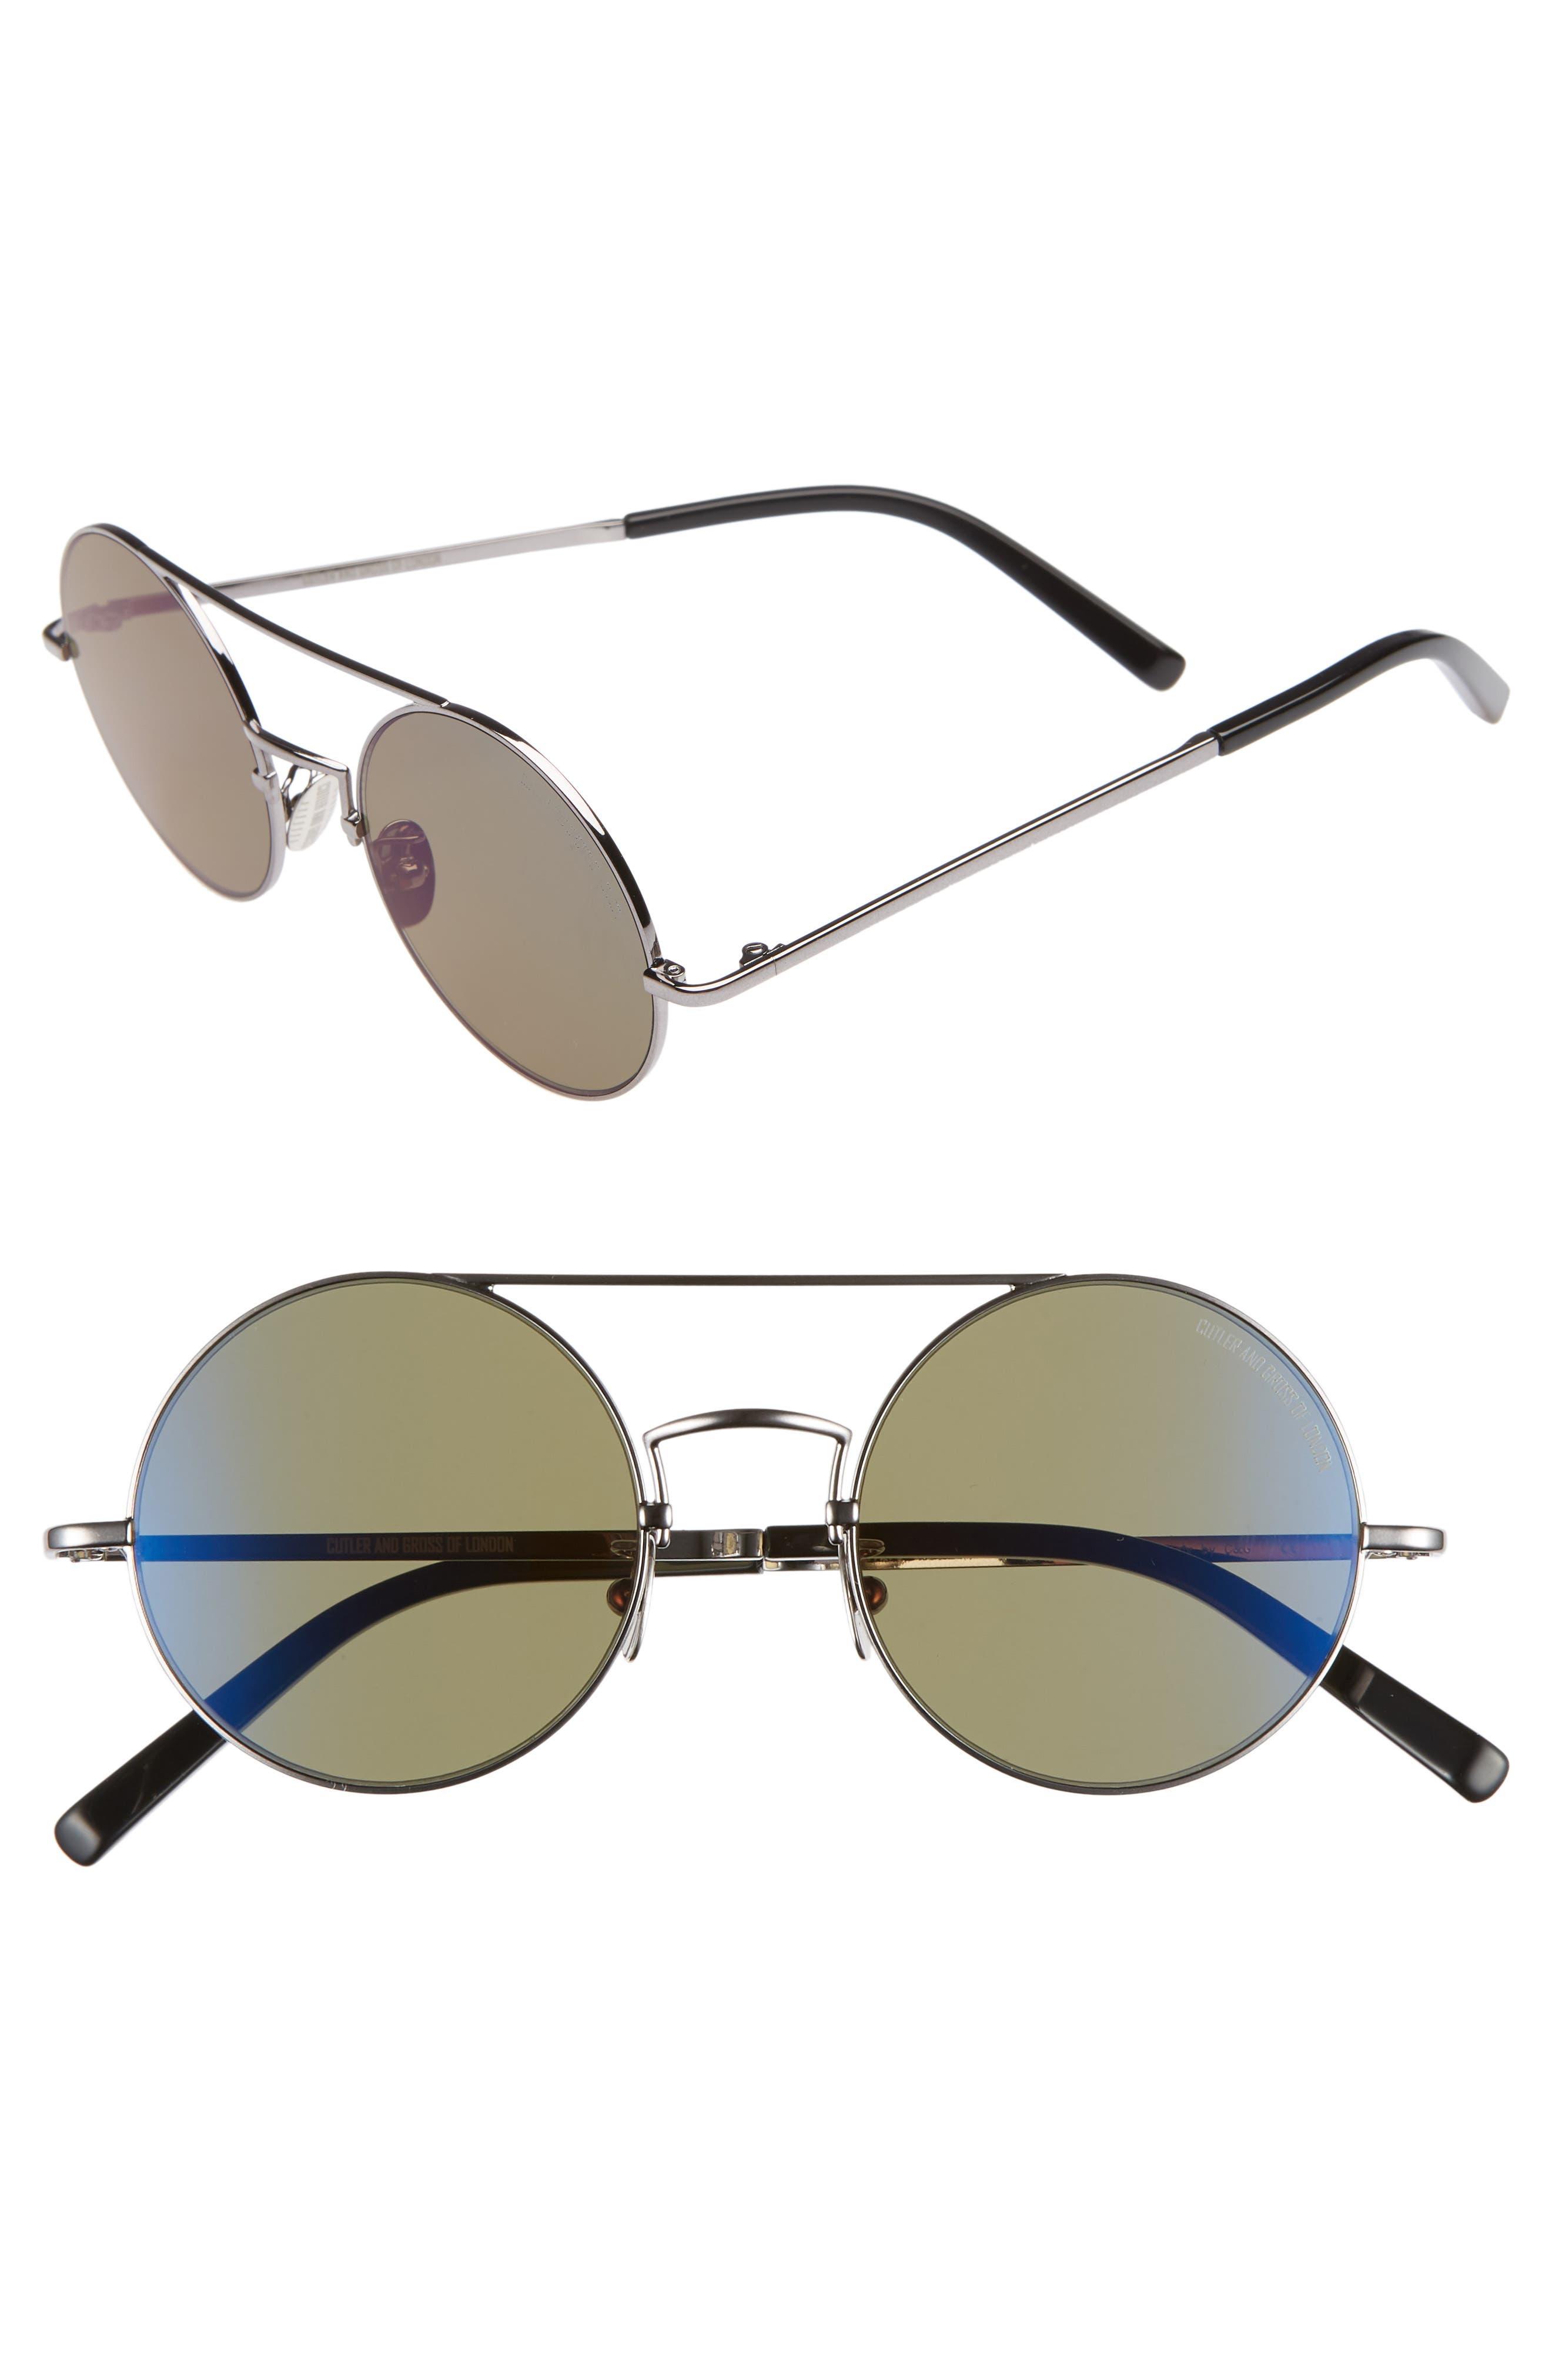 49mm Polarized Round Sunglasses,                         Main,                         color, RUTHENIUM METAL/ DARK GREEN